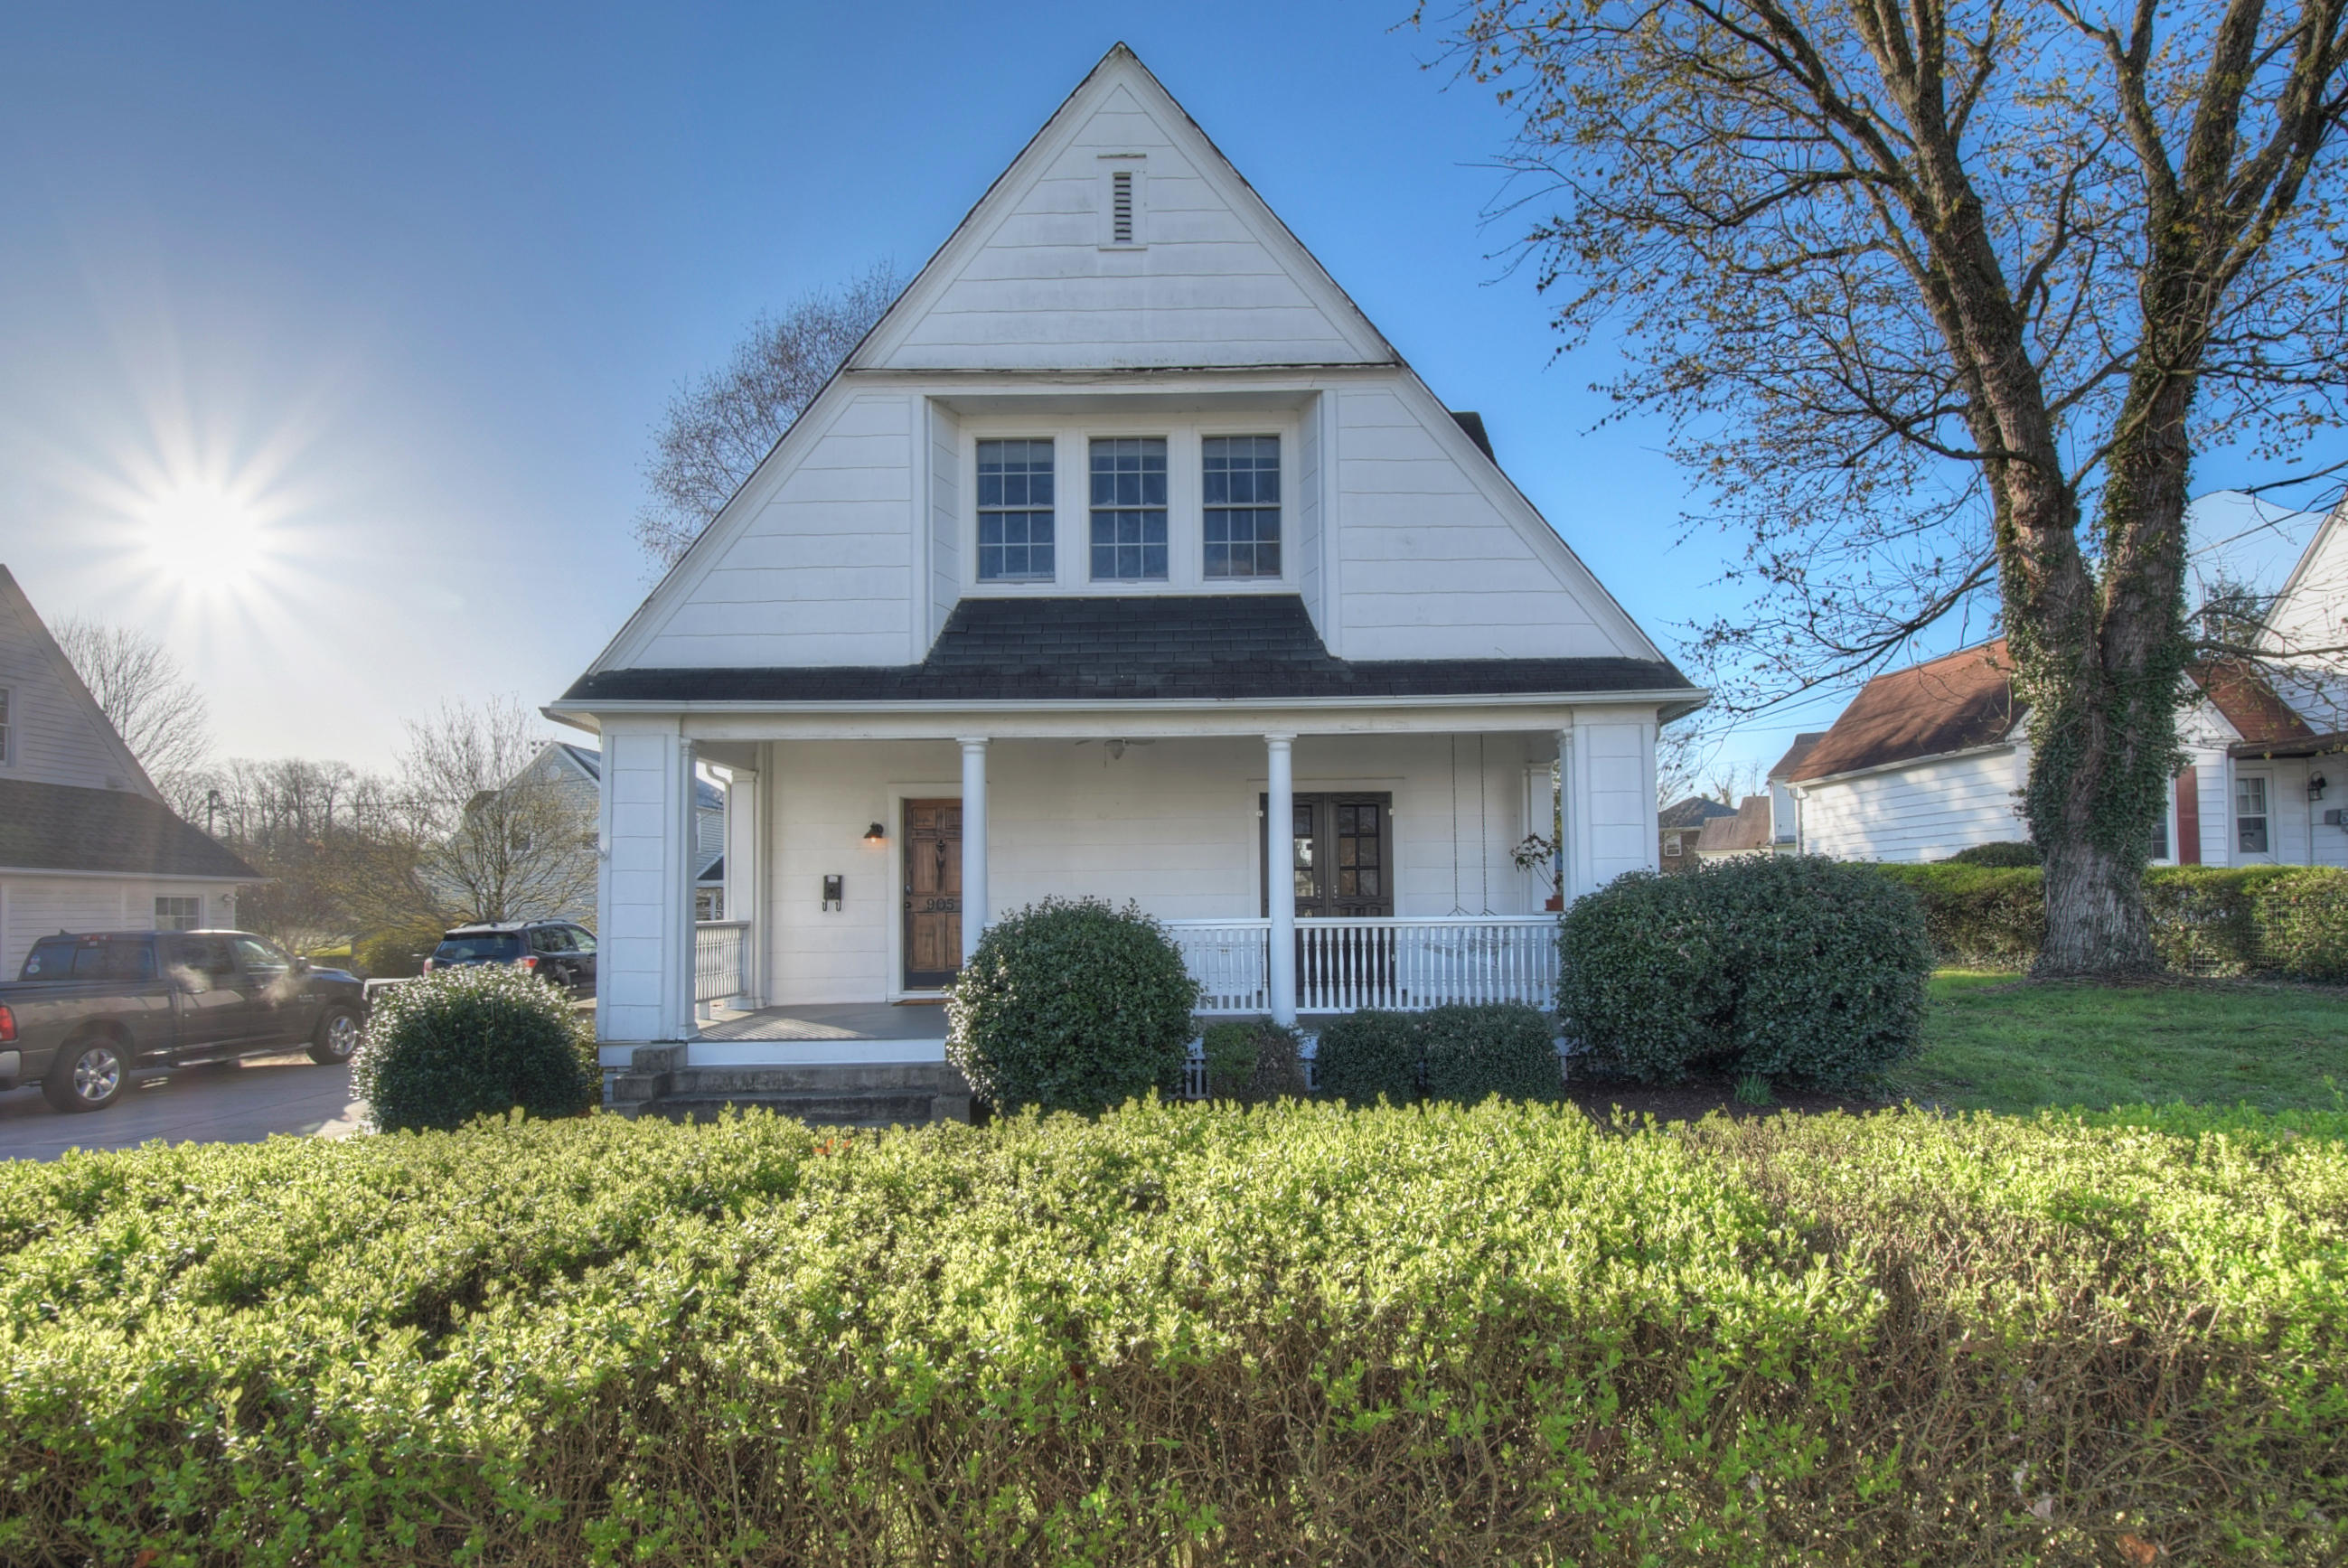 905 Norwood Street, Kingsport, Tennessee 37660, 3 Bedrooms Bedrooms, ,2 BathroomsBathrooms,Single Family,For Sale,905 Norwood Street,9920730